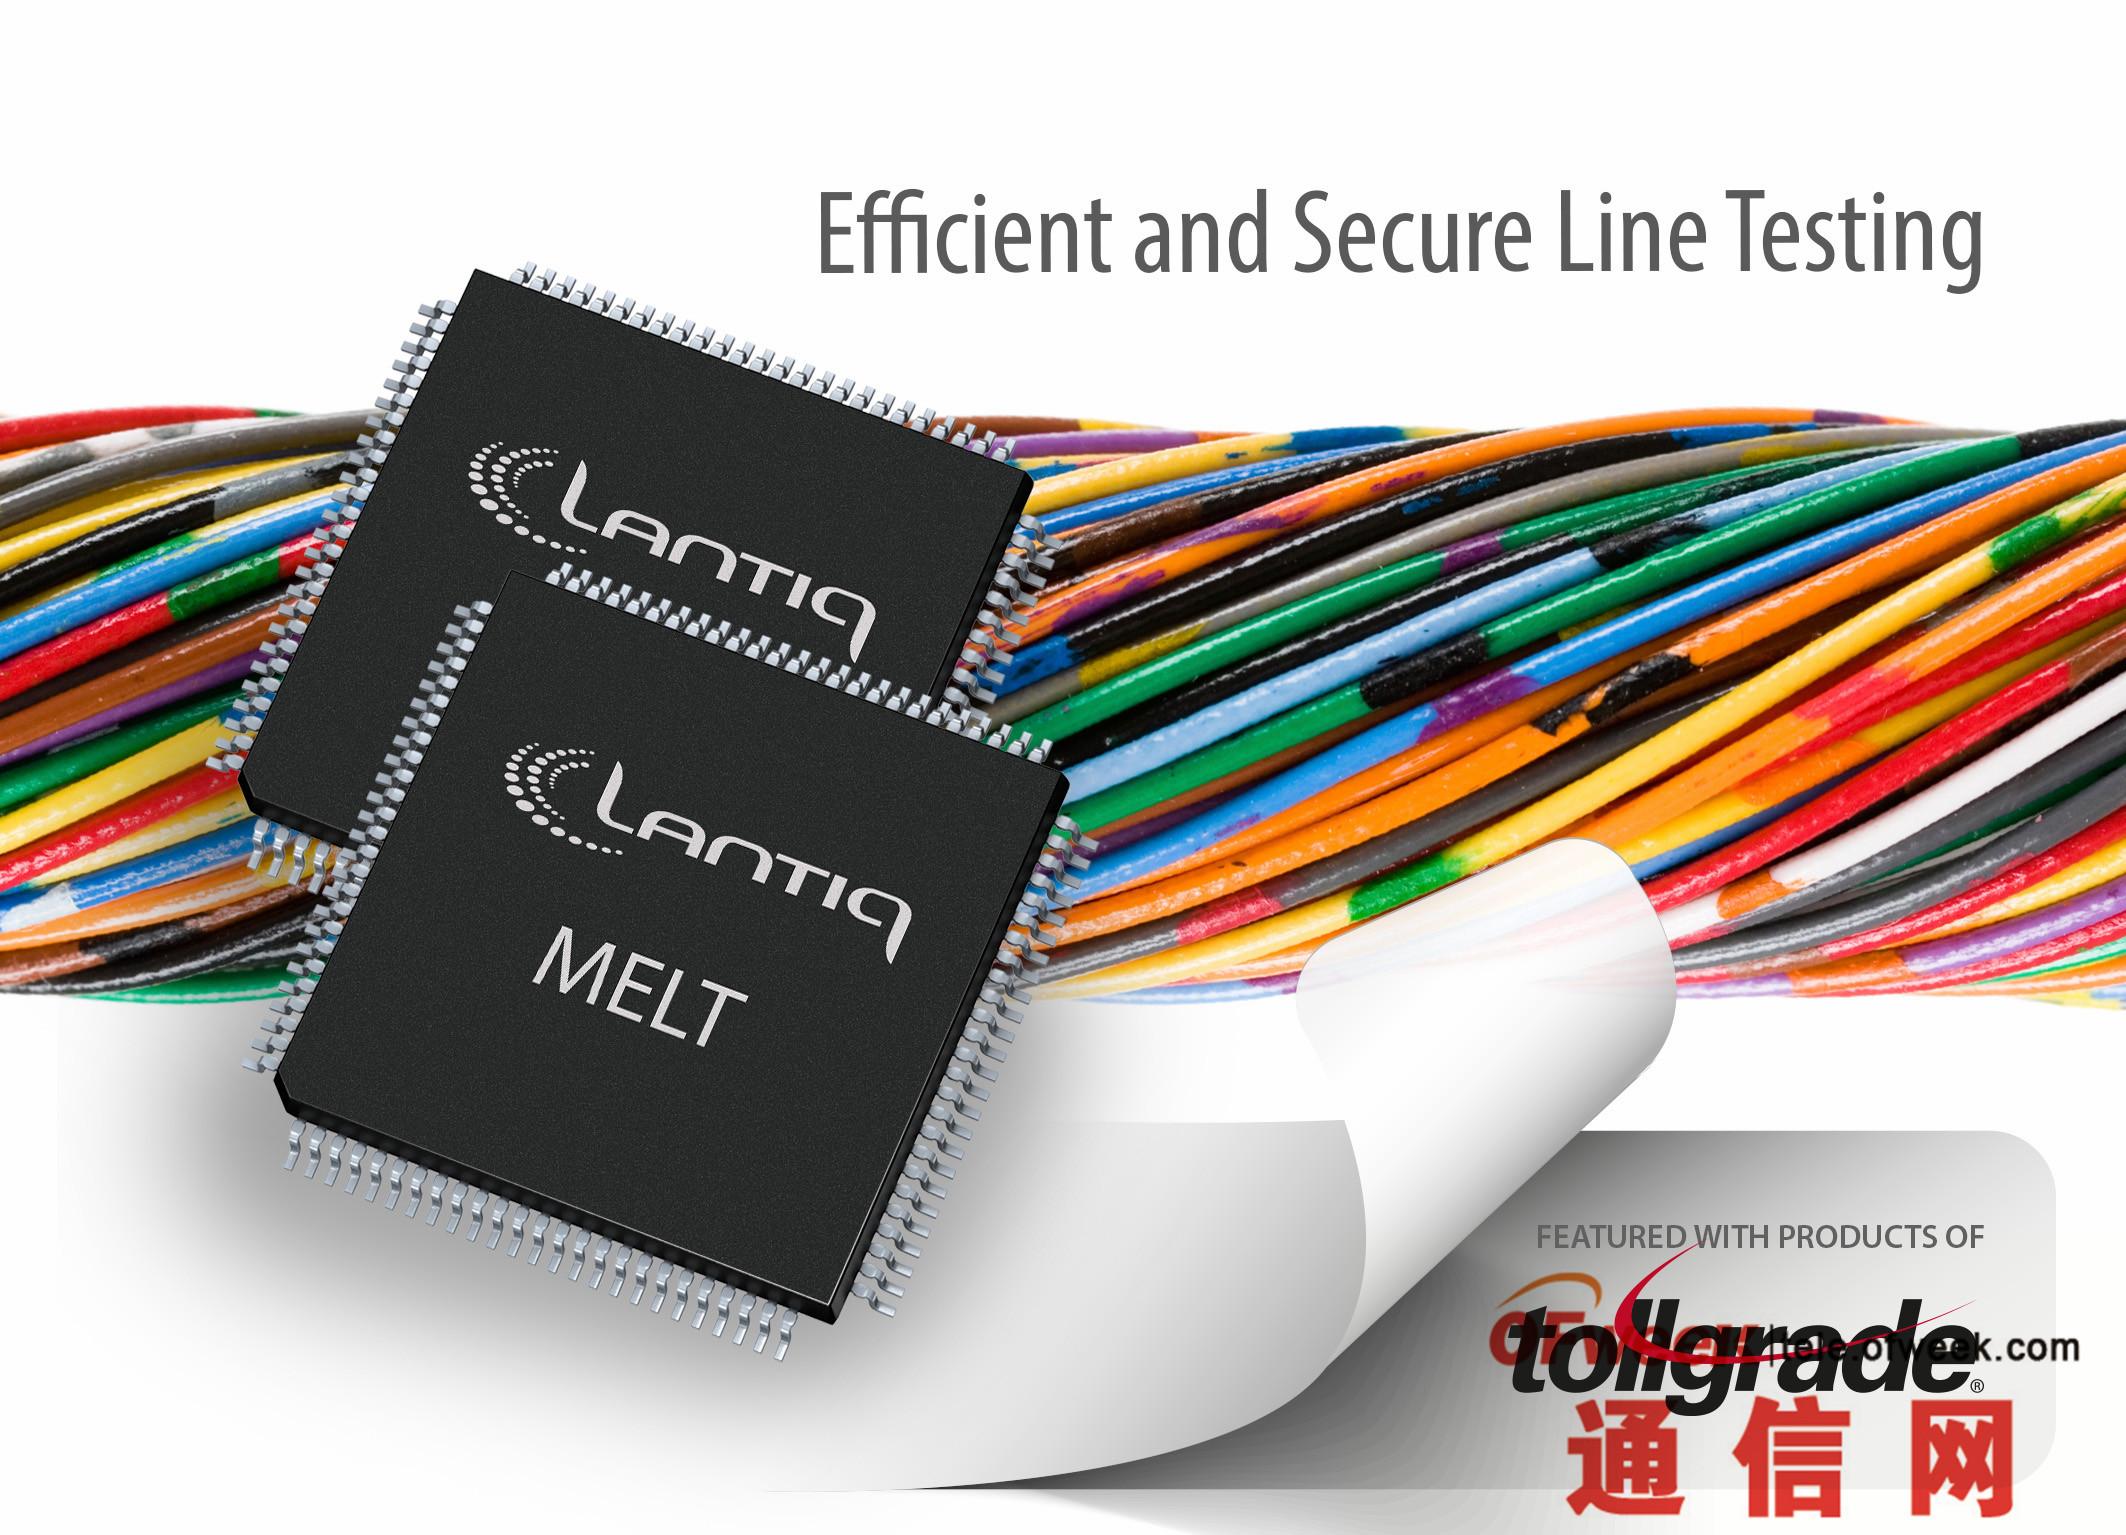 Tollgrade和Lantiq携手为全IP网络提供下一代DSL在线测试